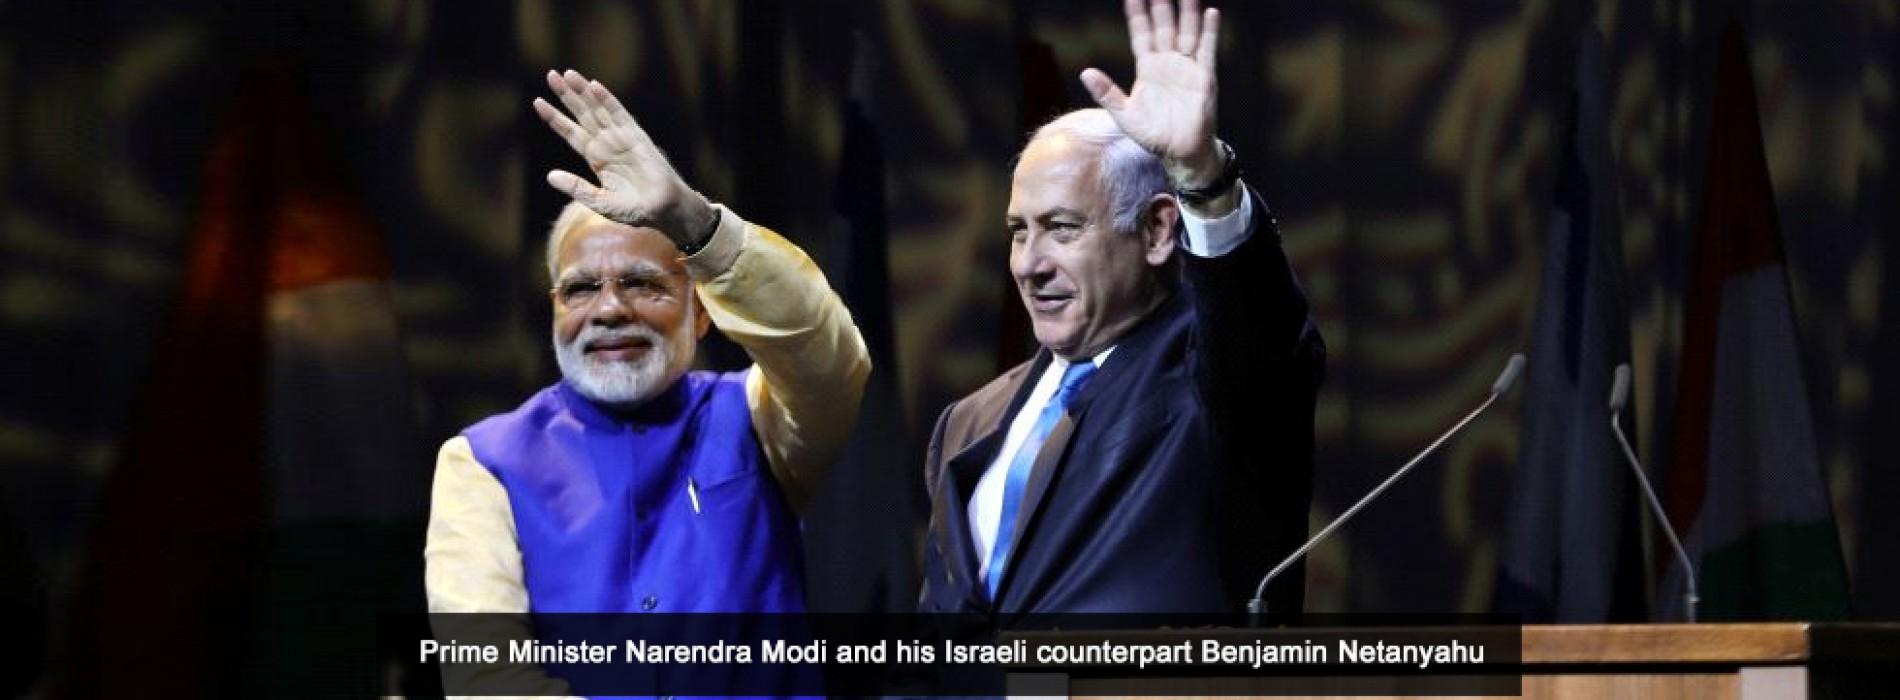 Israel's Benjamin Netanyahu to visit India next week, to hold Roadshow with PM Modi in Gujarat